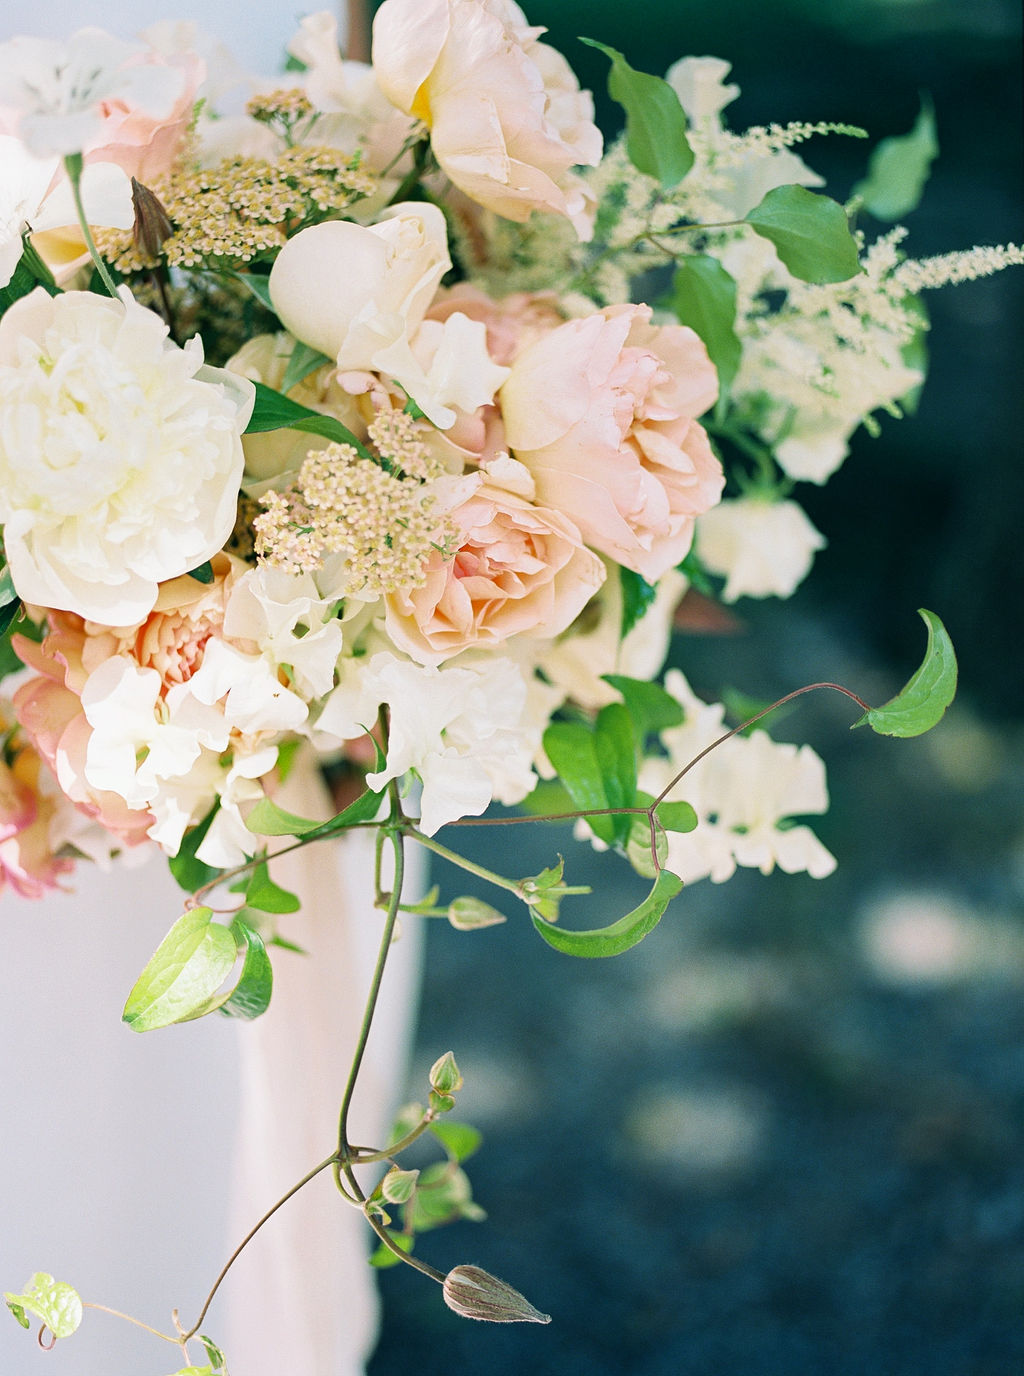 Alexandra-Elise-Photography-Film-Wedding-Photographer-Sonnenberg-Gardens-Finger-Lakes-Canandaigua-Bride-Groom-029.jpg